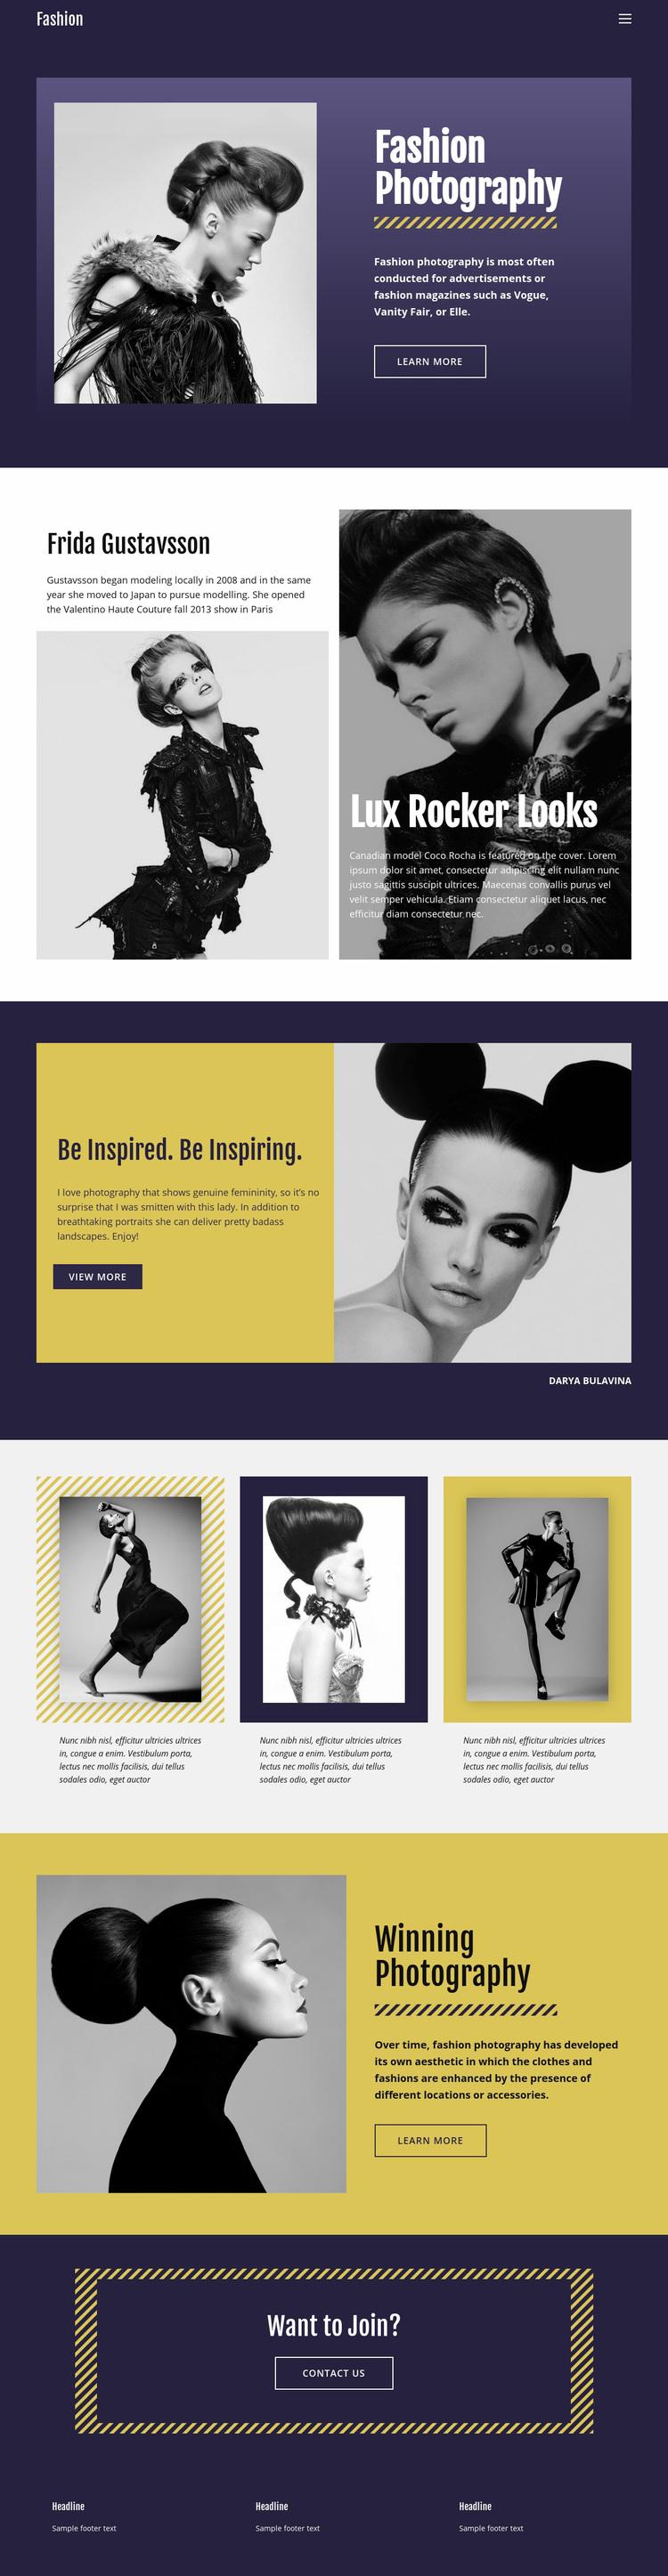 Fashion Photography Classic Style Web Page Designer